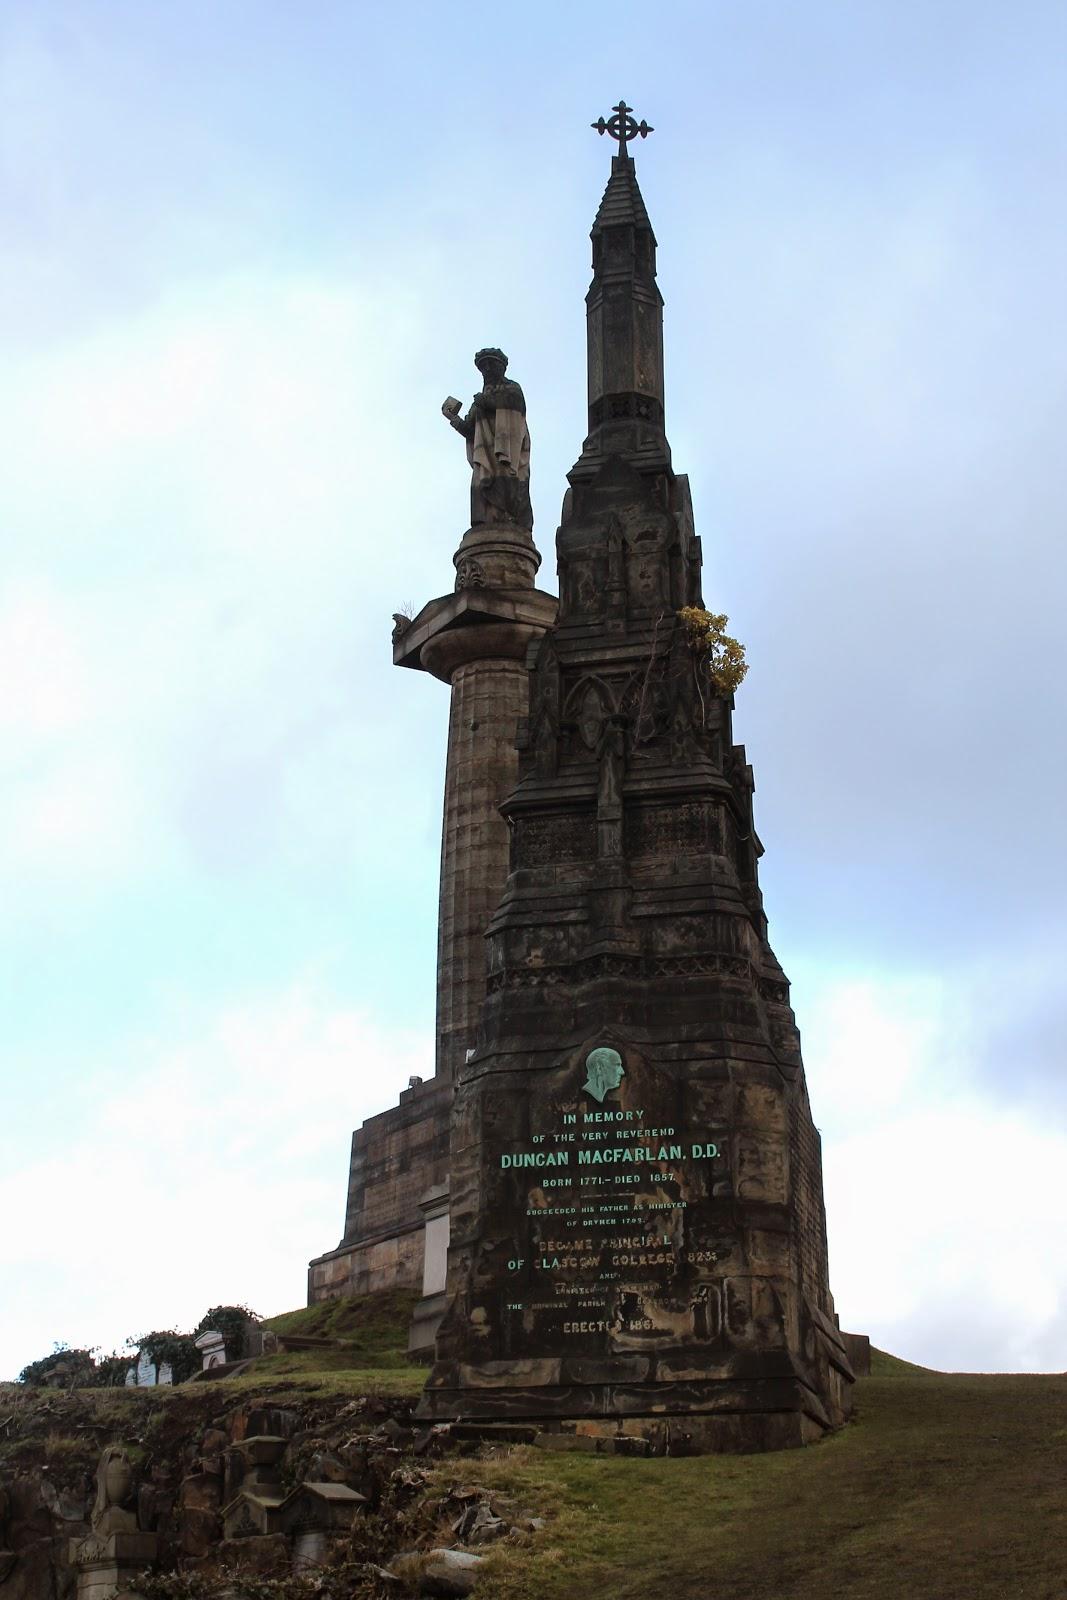 Glasgow Necropolis statue